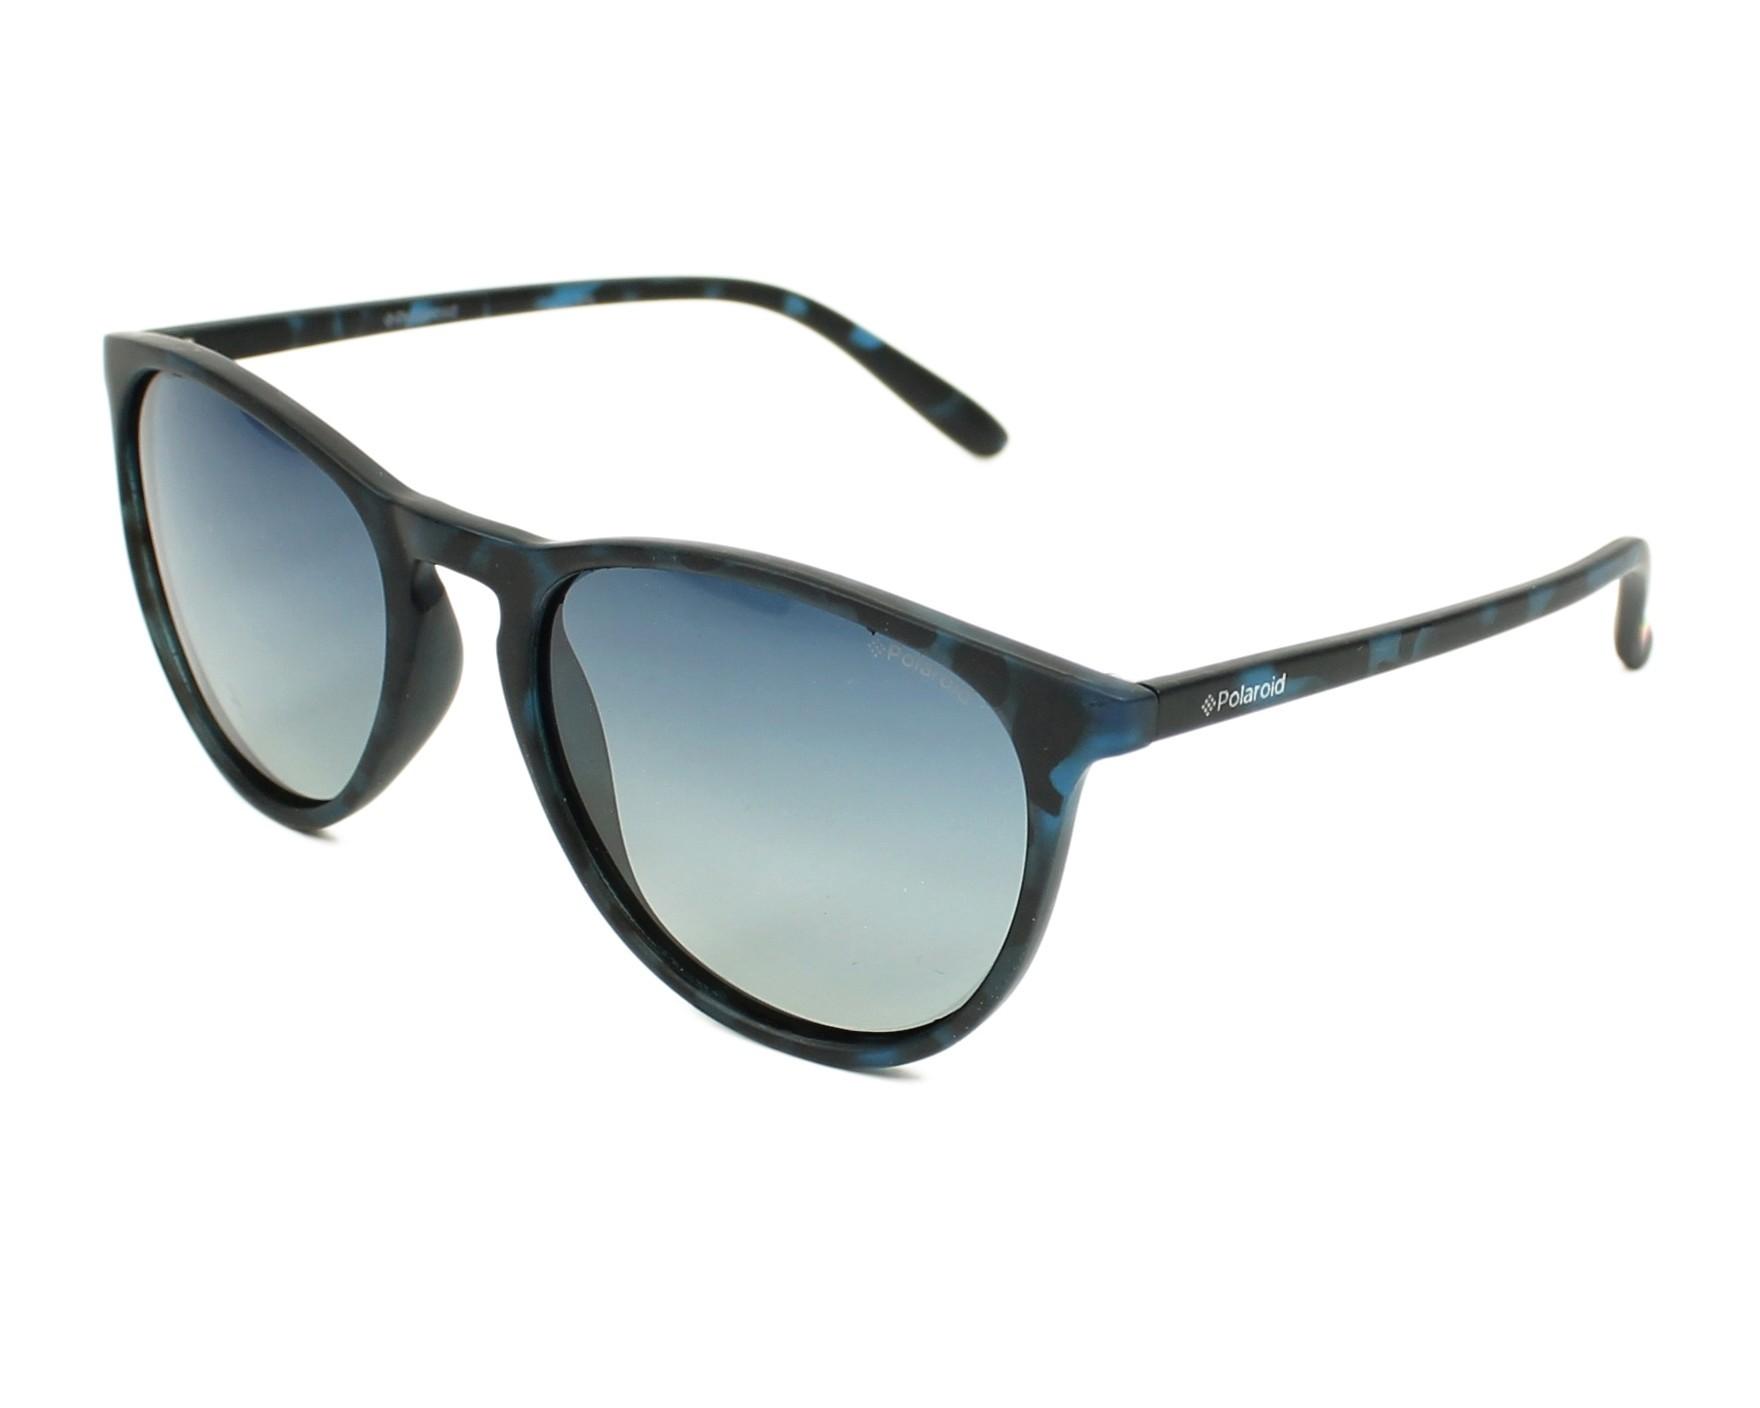 6003 N Secz7 Polaroid Pld Sunglasses UEqwSCU